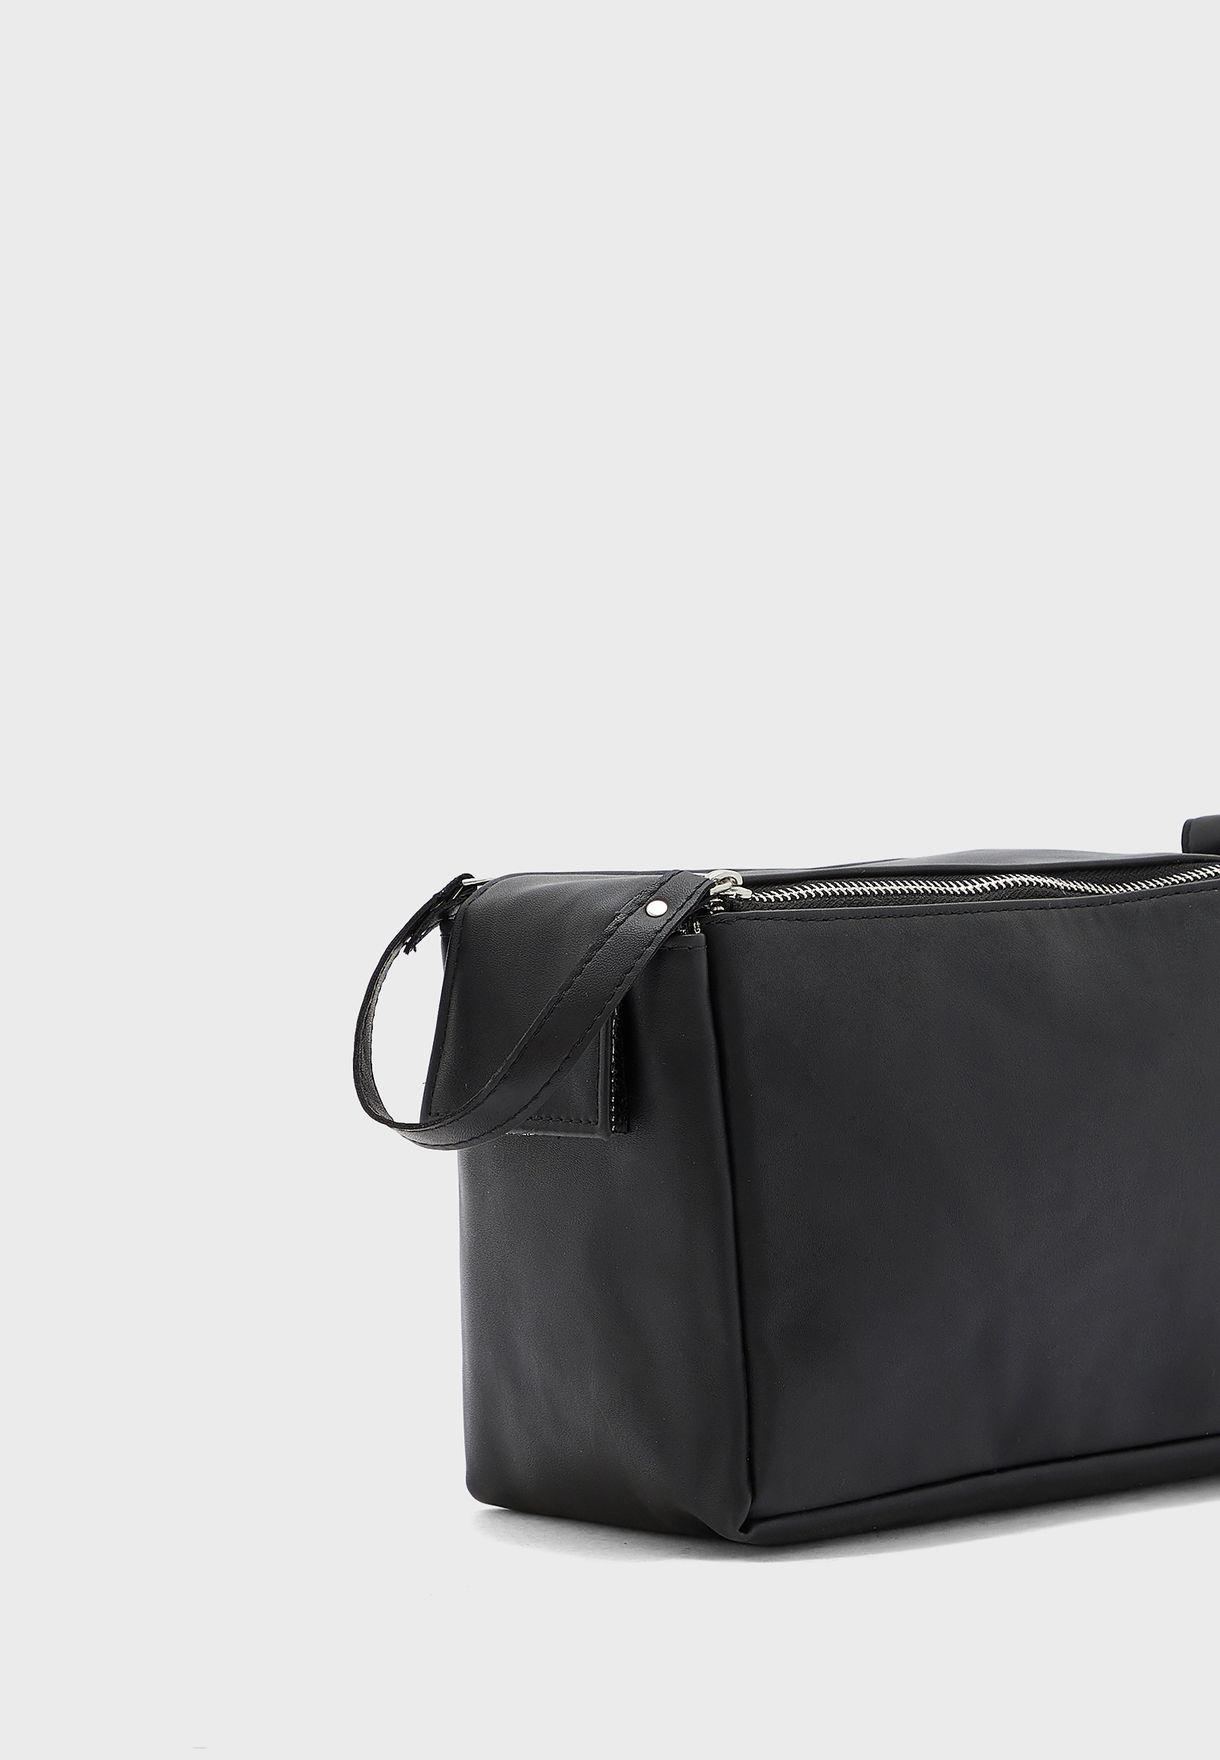 Carry On travel Kit  Bag